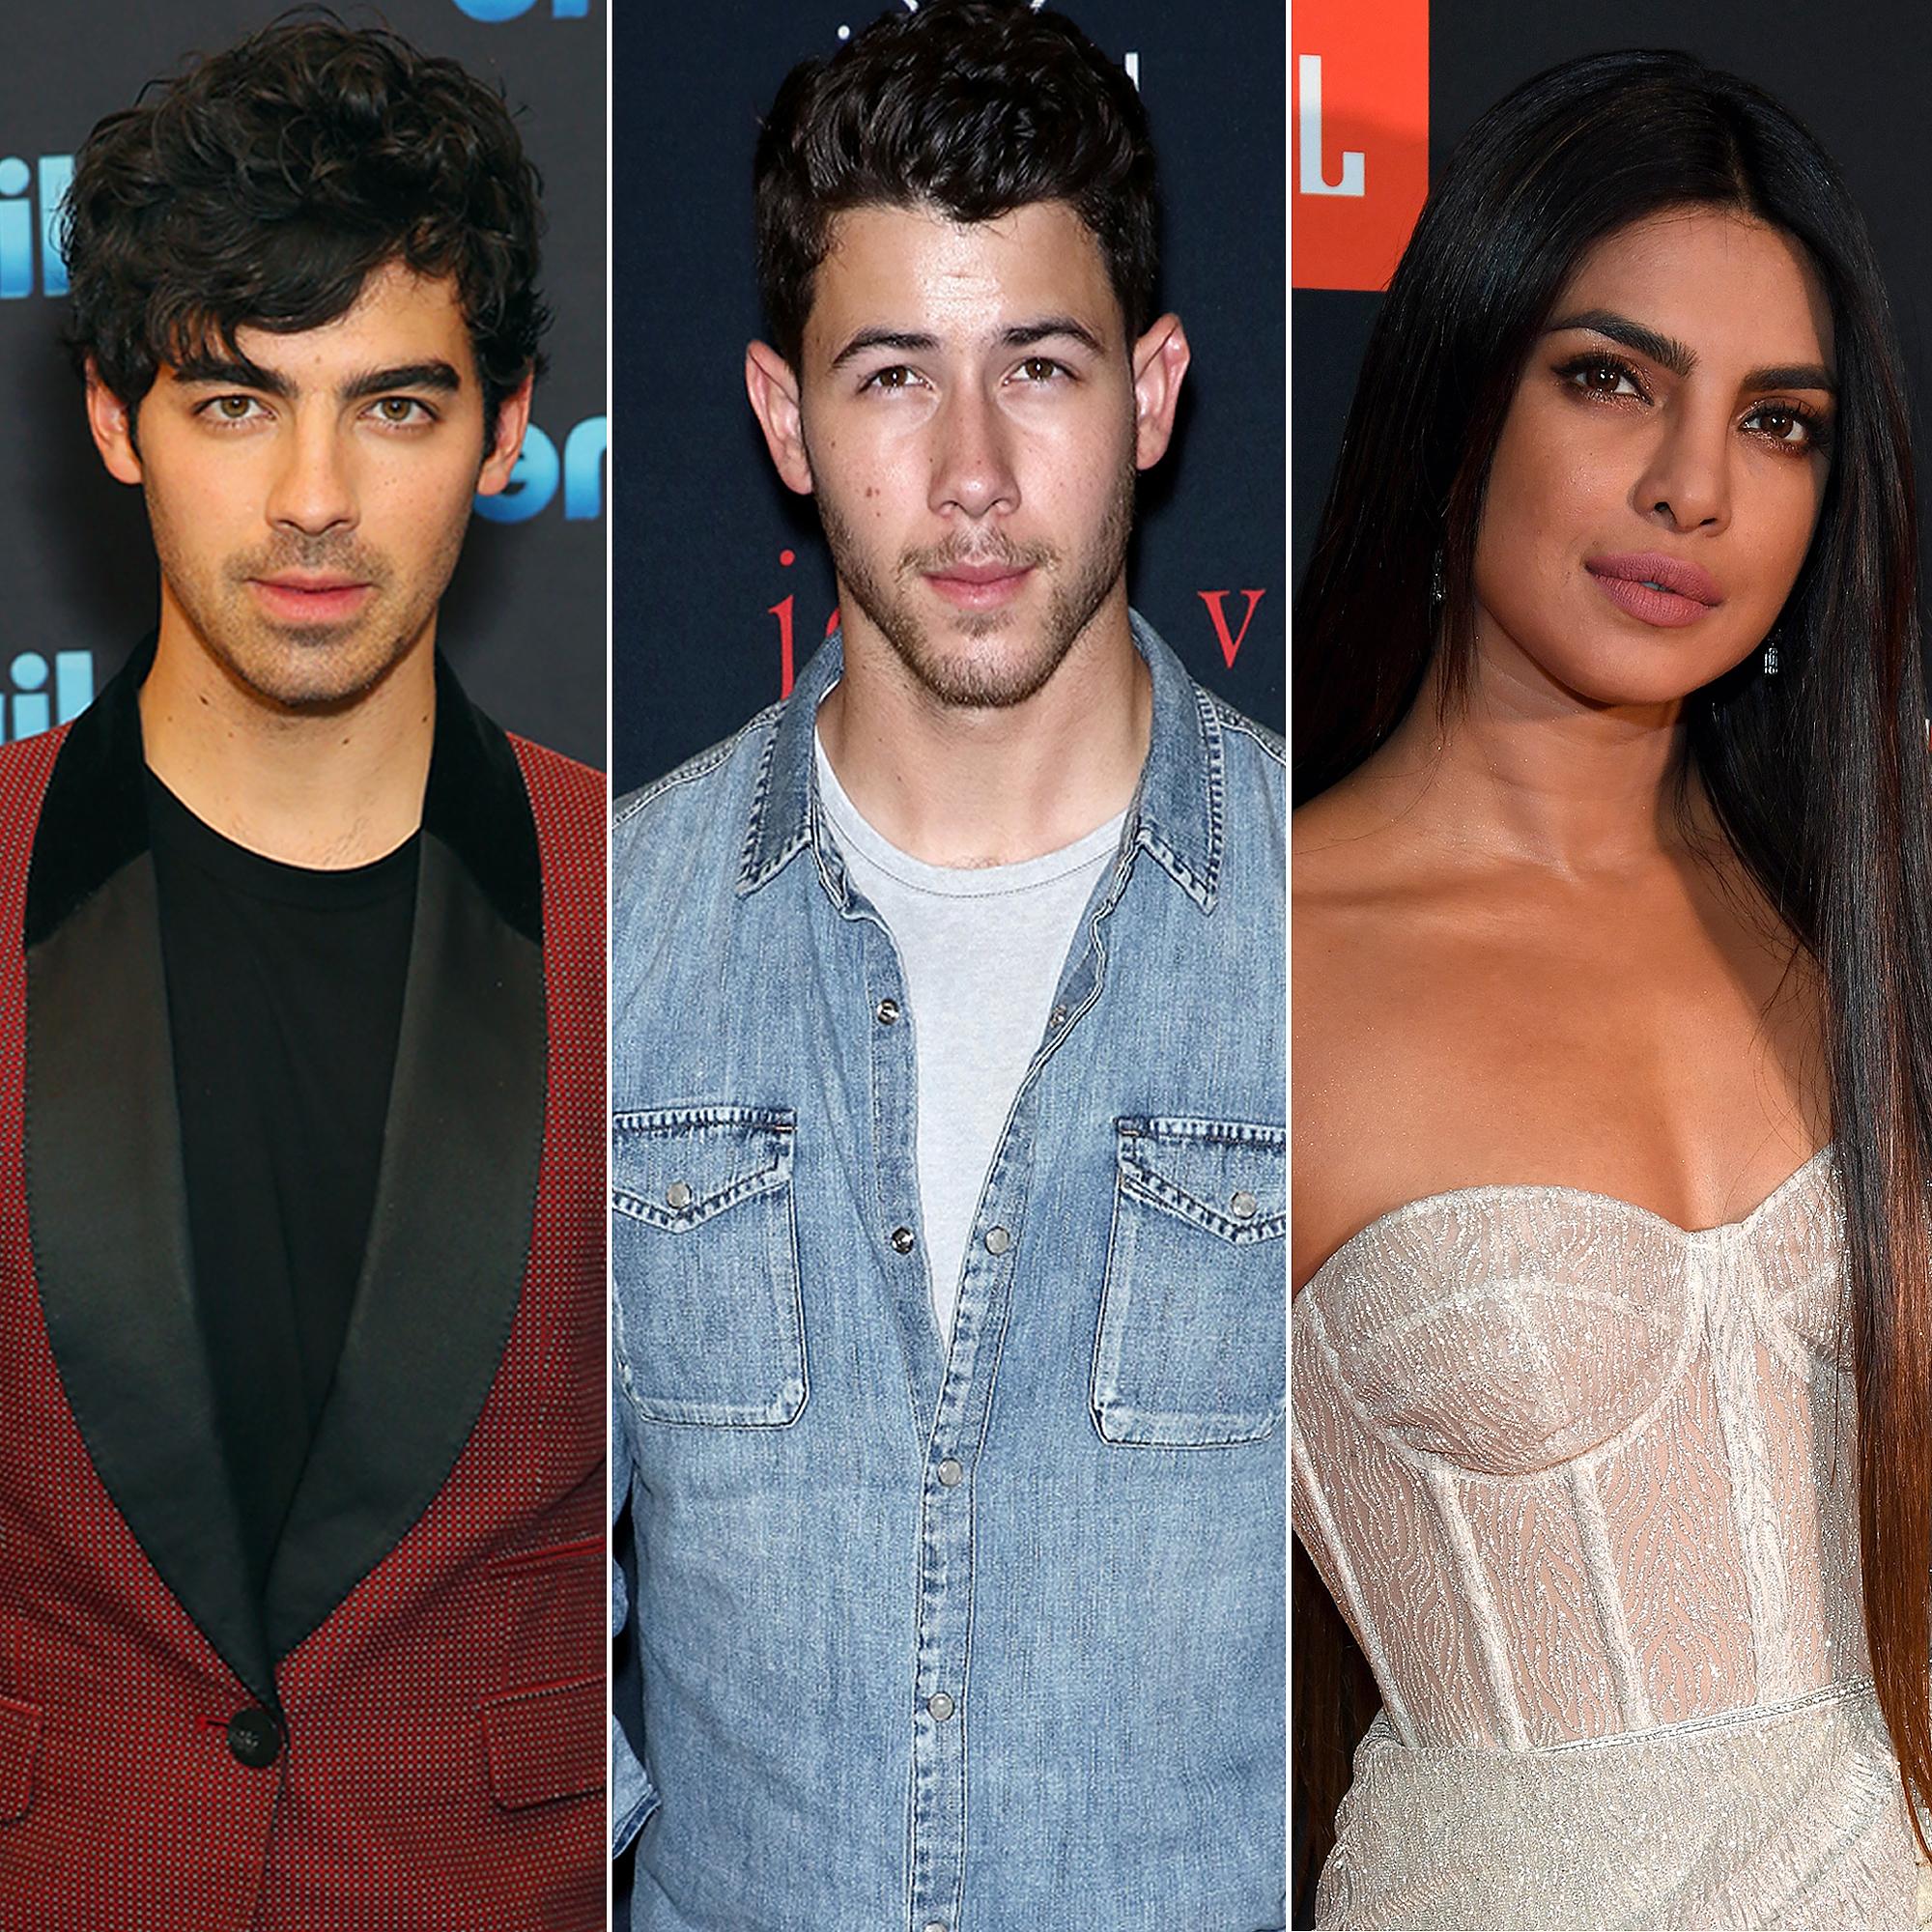 Joe Jonas: I Knew 'Right Away' Nick, Priyanka 'Were A